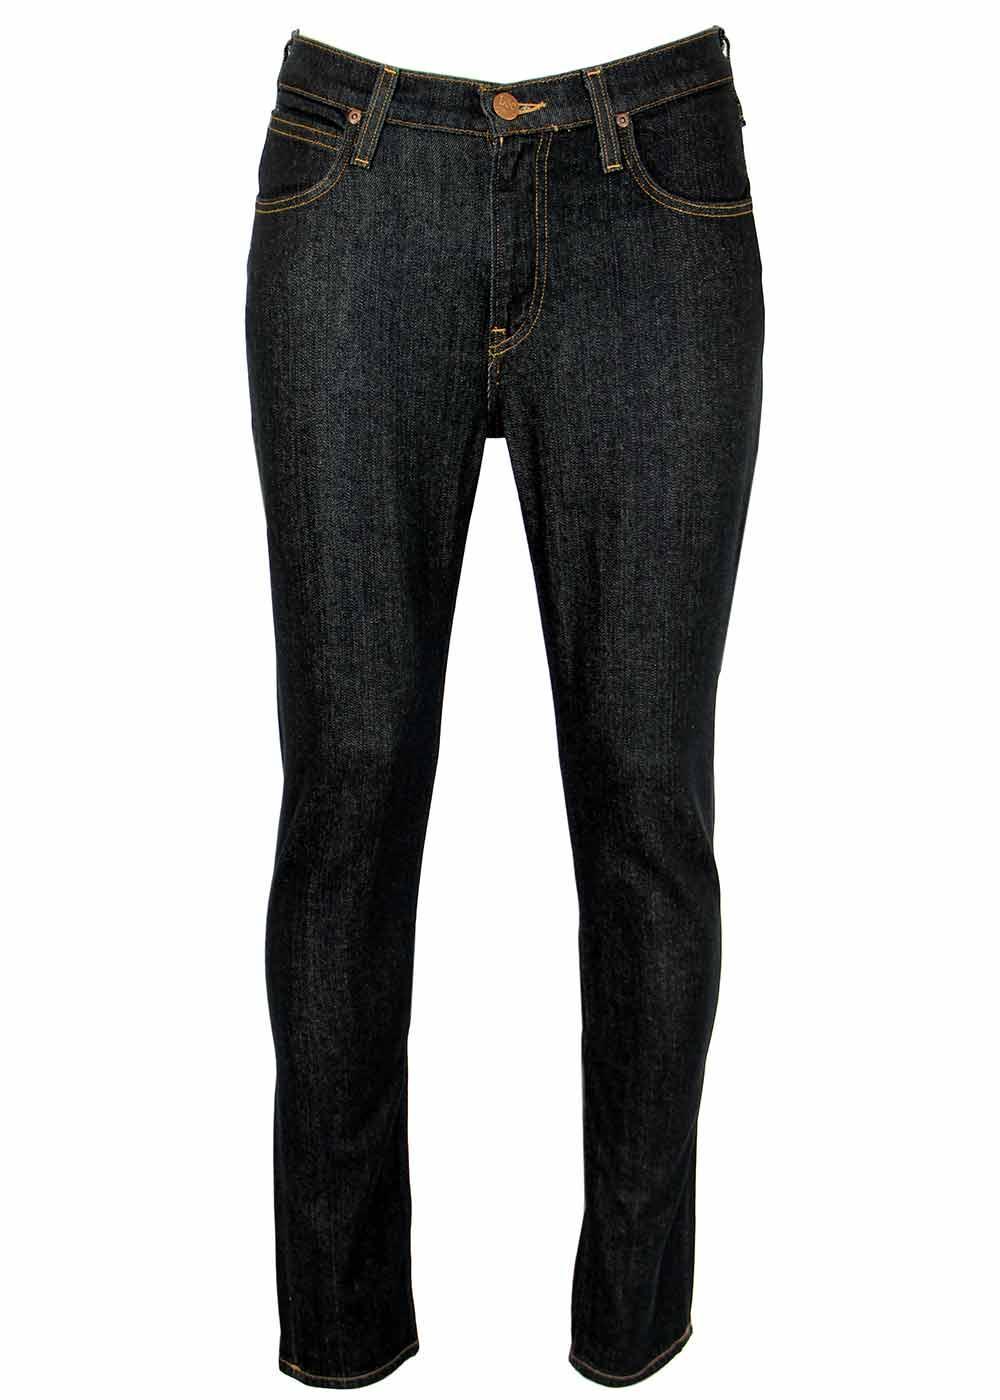 Arvin LEE Retro Mod Regular Tapered Denim Jeans BC